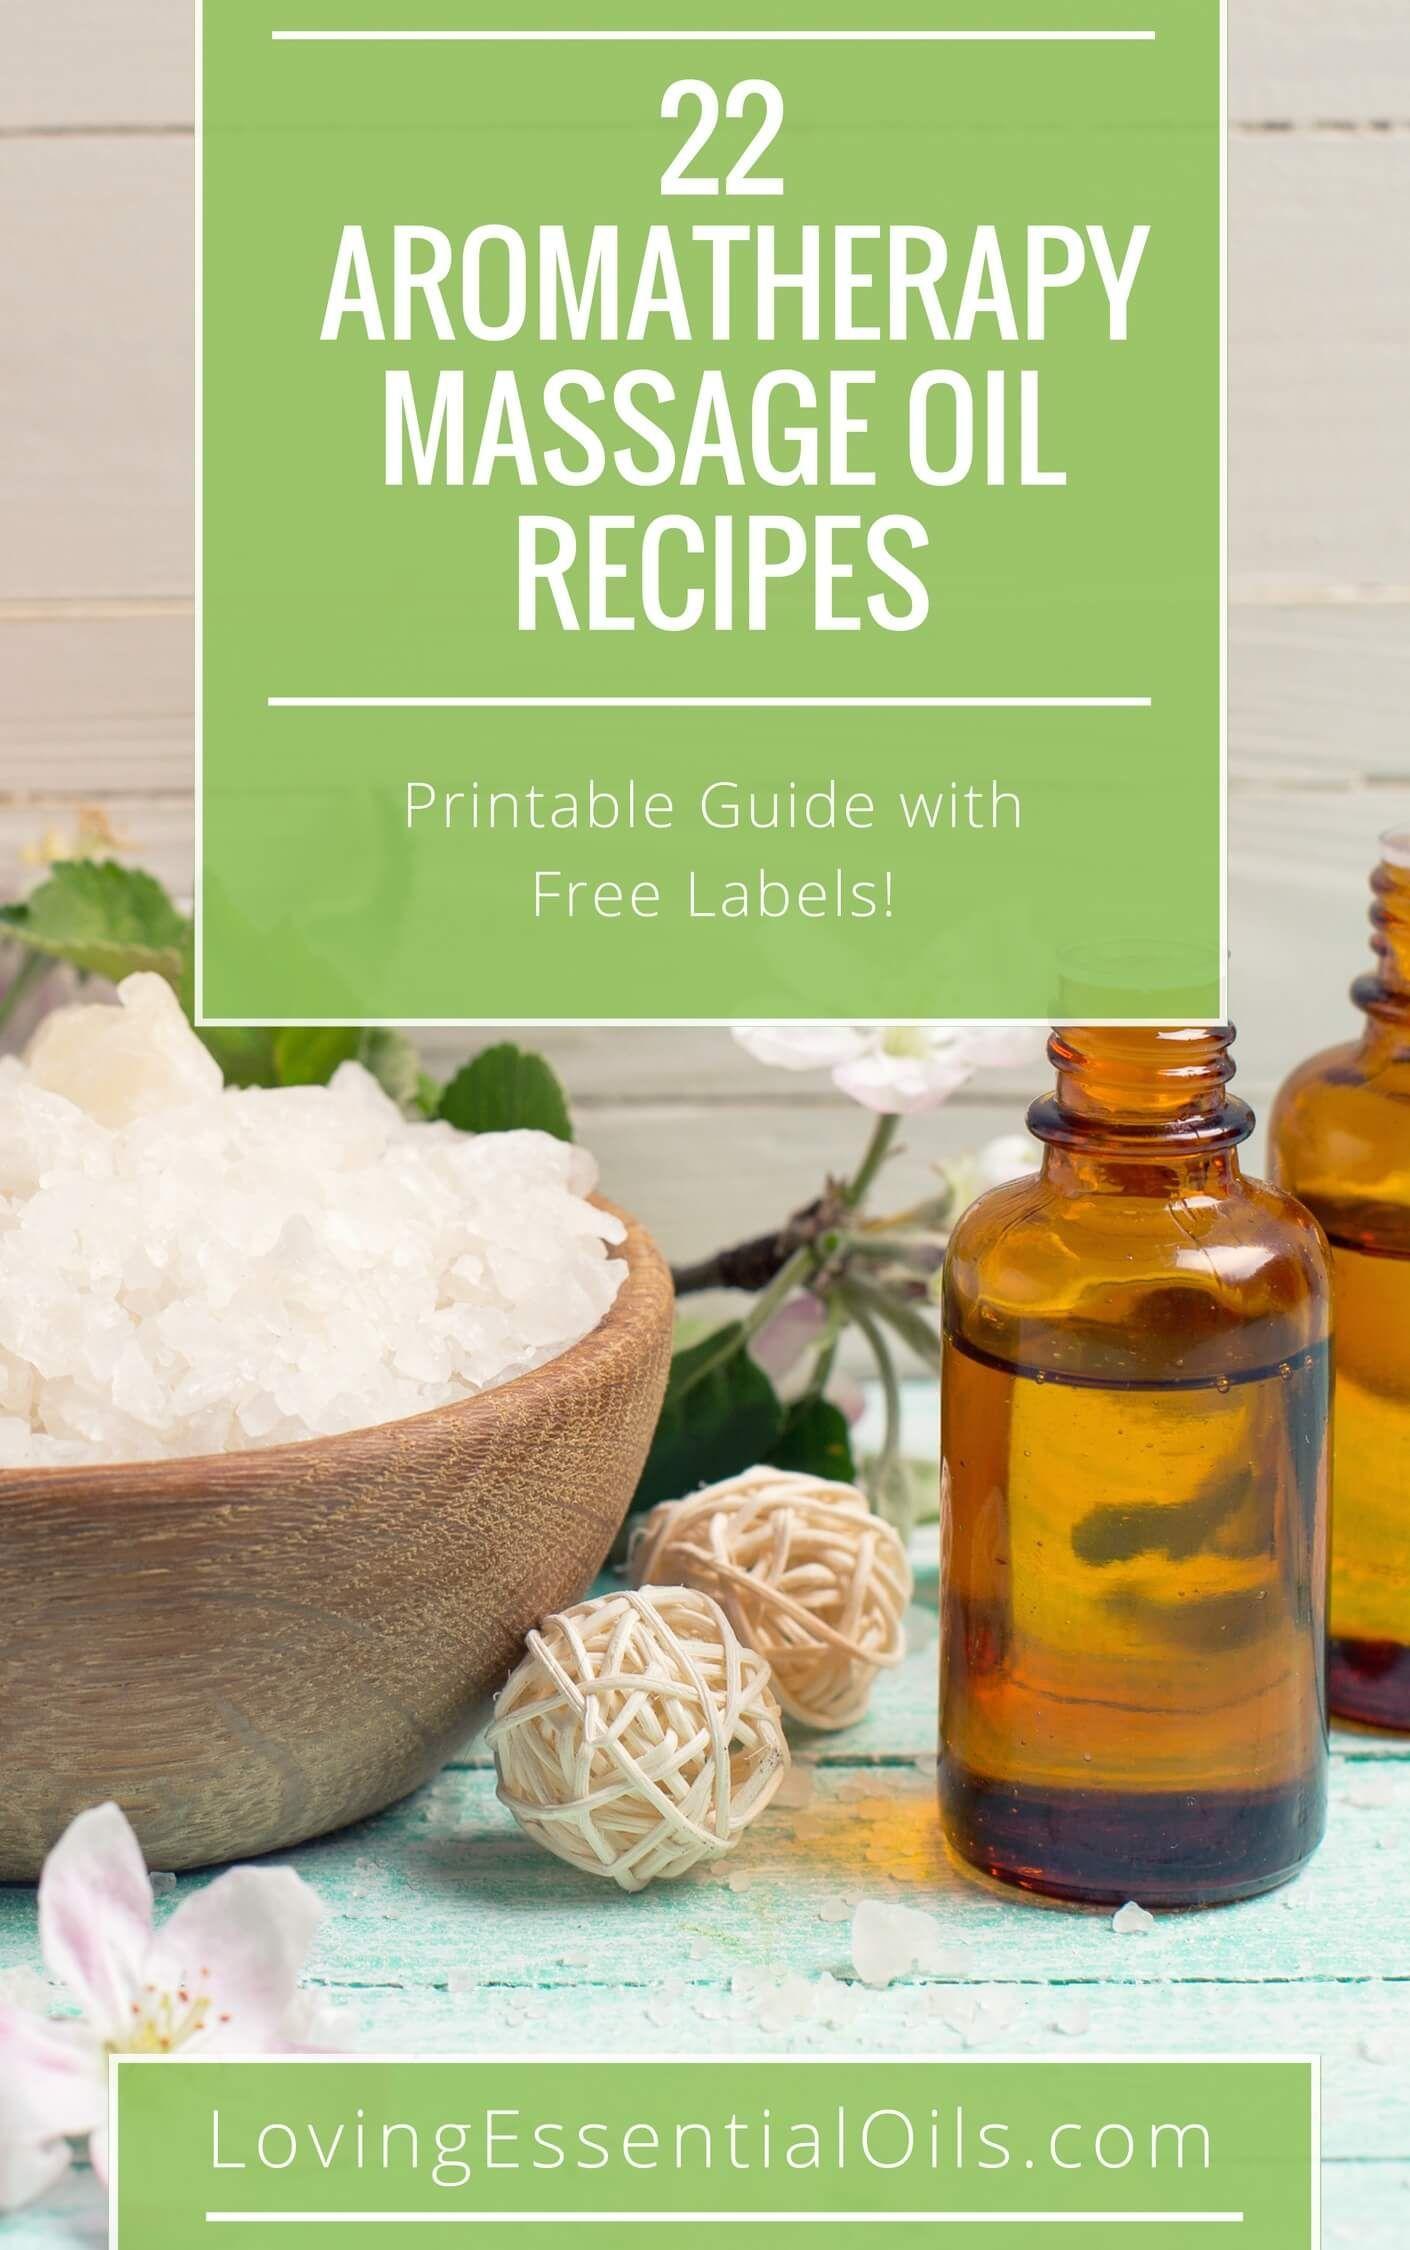 22 Aromatherapy Massage Oils Free Recipe Guide Loving Essential Oils Massages Aromatherapy Recipes Aromatherapy Massage Oils Diy Essential Oil Recipes